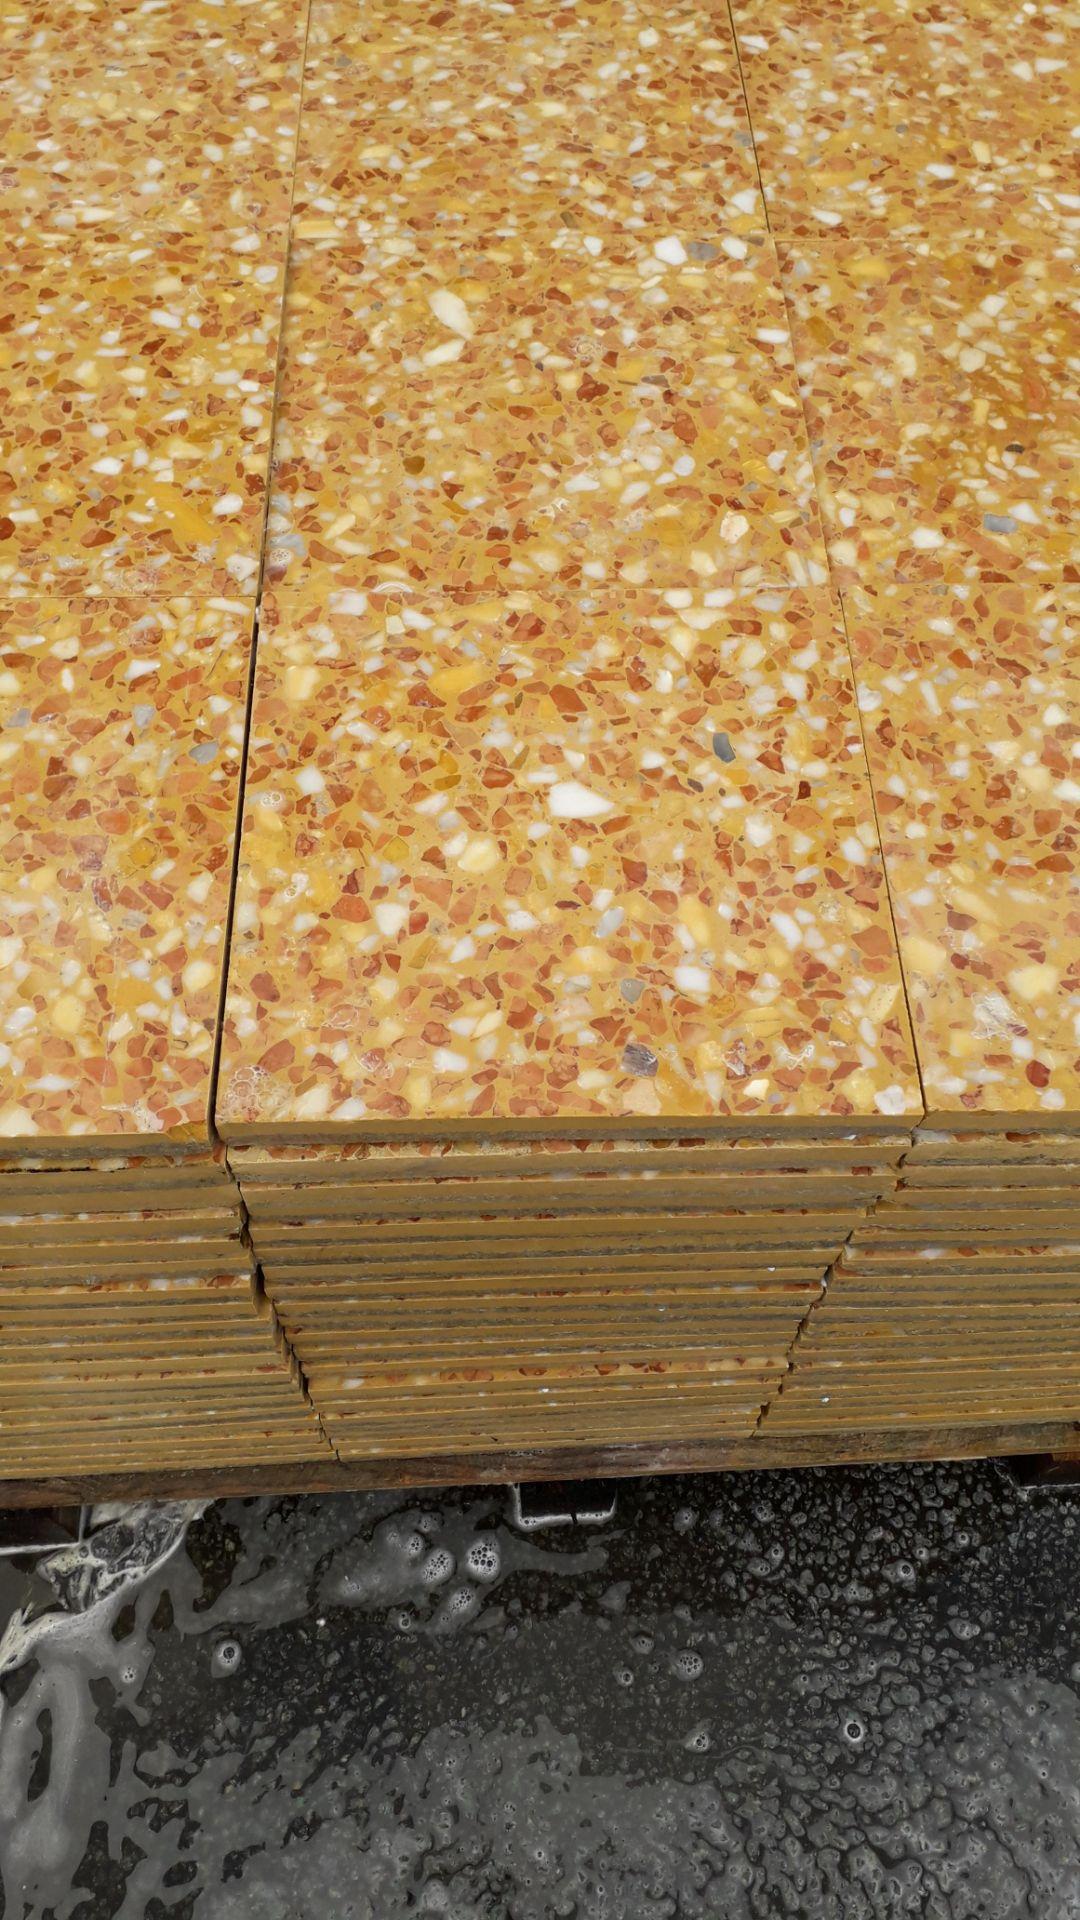 Lot 9 - 1 x pallet (L 07802) Commercial Floor Tiles - Total coverage 20 square yards